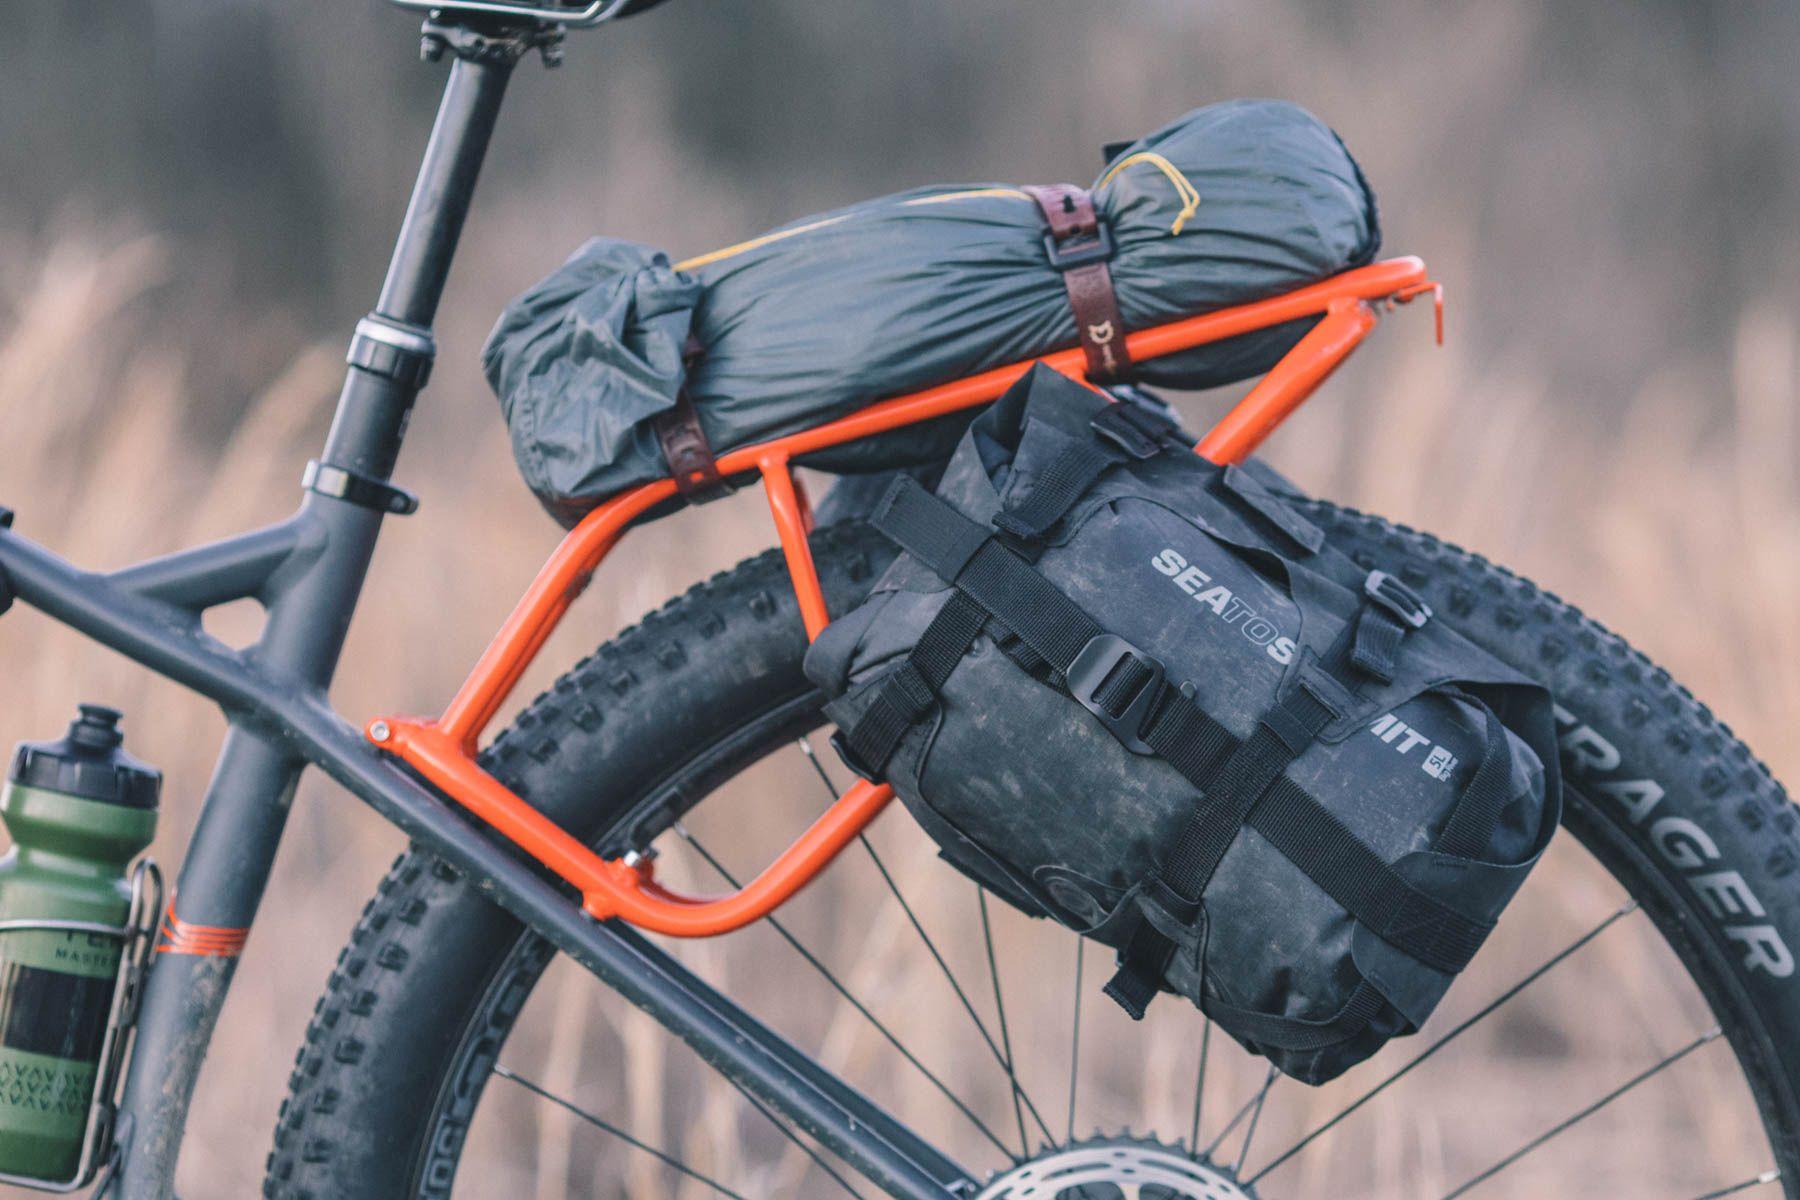 Trek 1120 Review Bikepacking Com Bicycle Workout Bicycle Camping Touring Bike